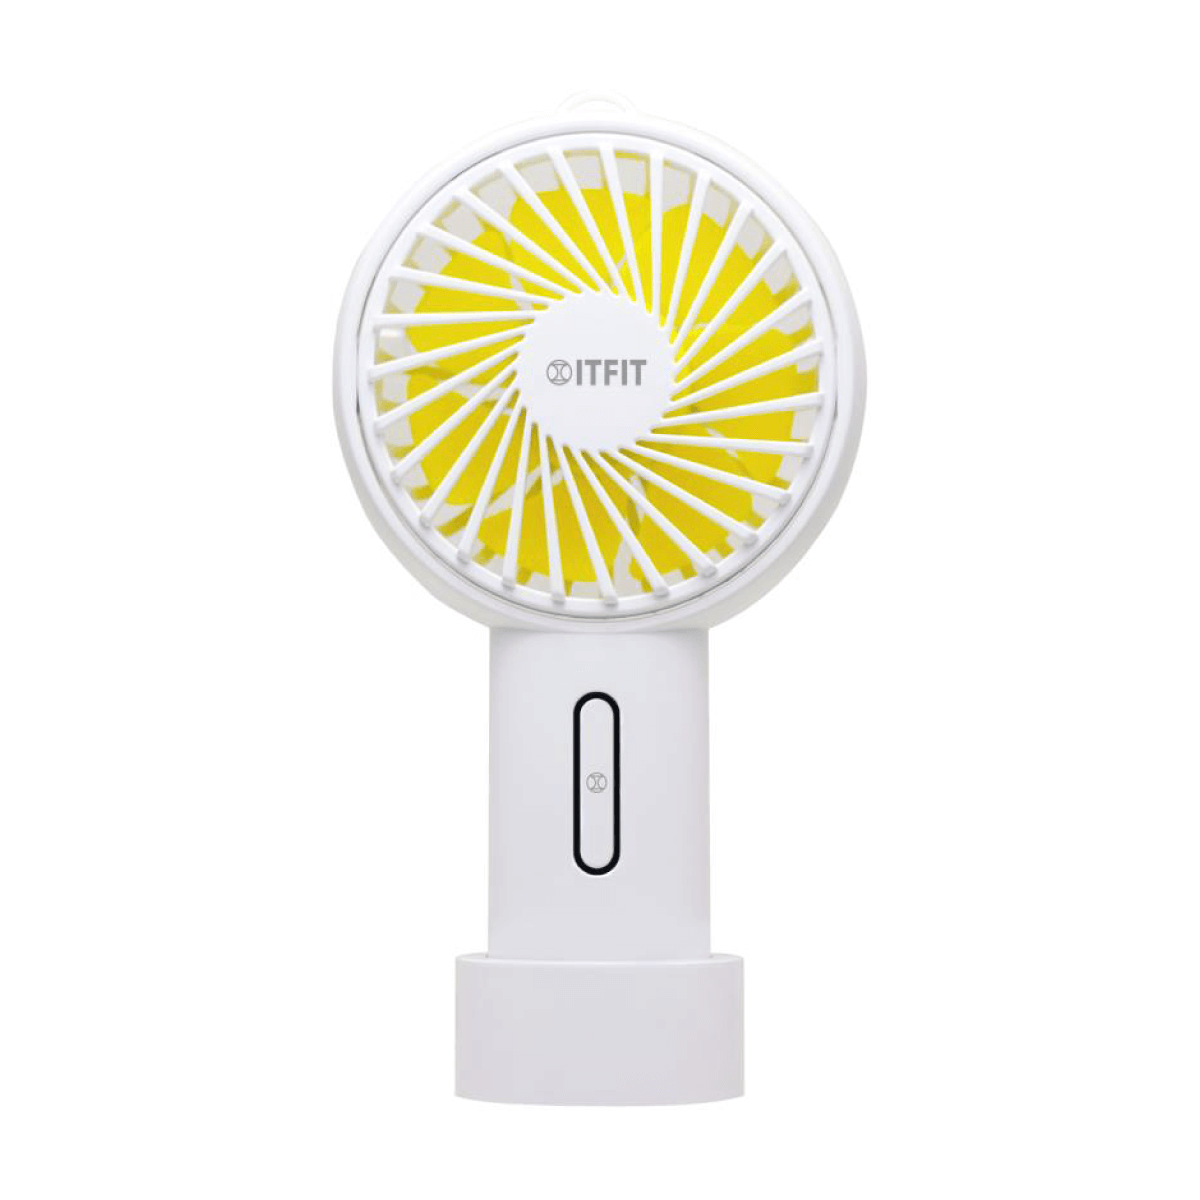 Angle Adjustable Fan